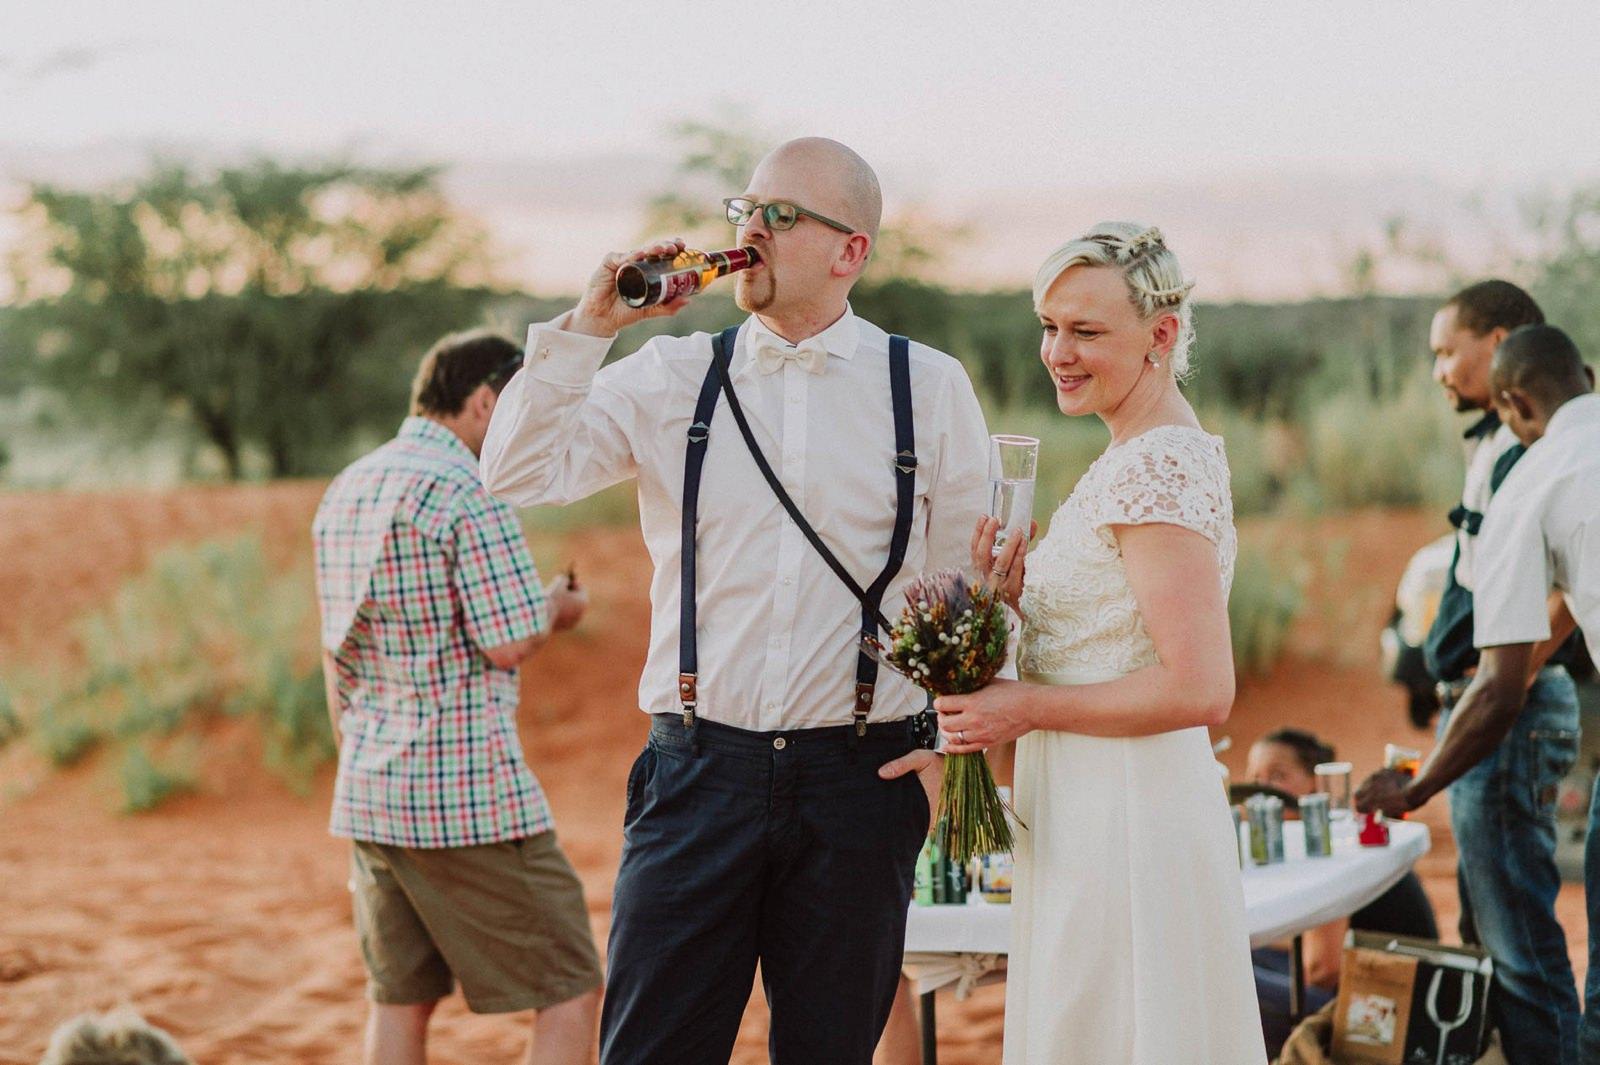 heiraten-in-namibia-8720.jpg